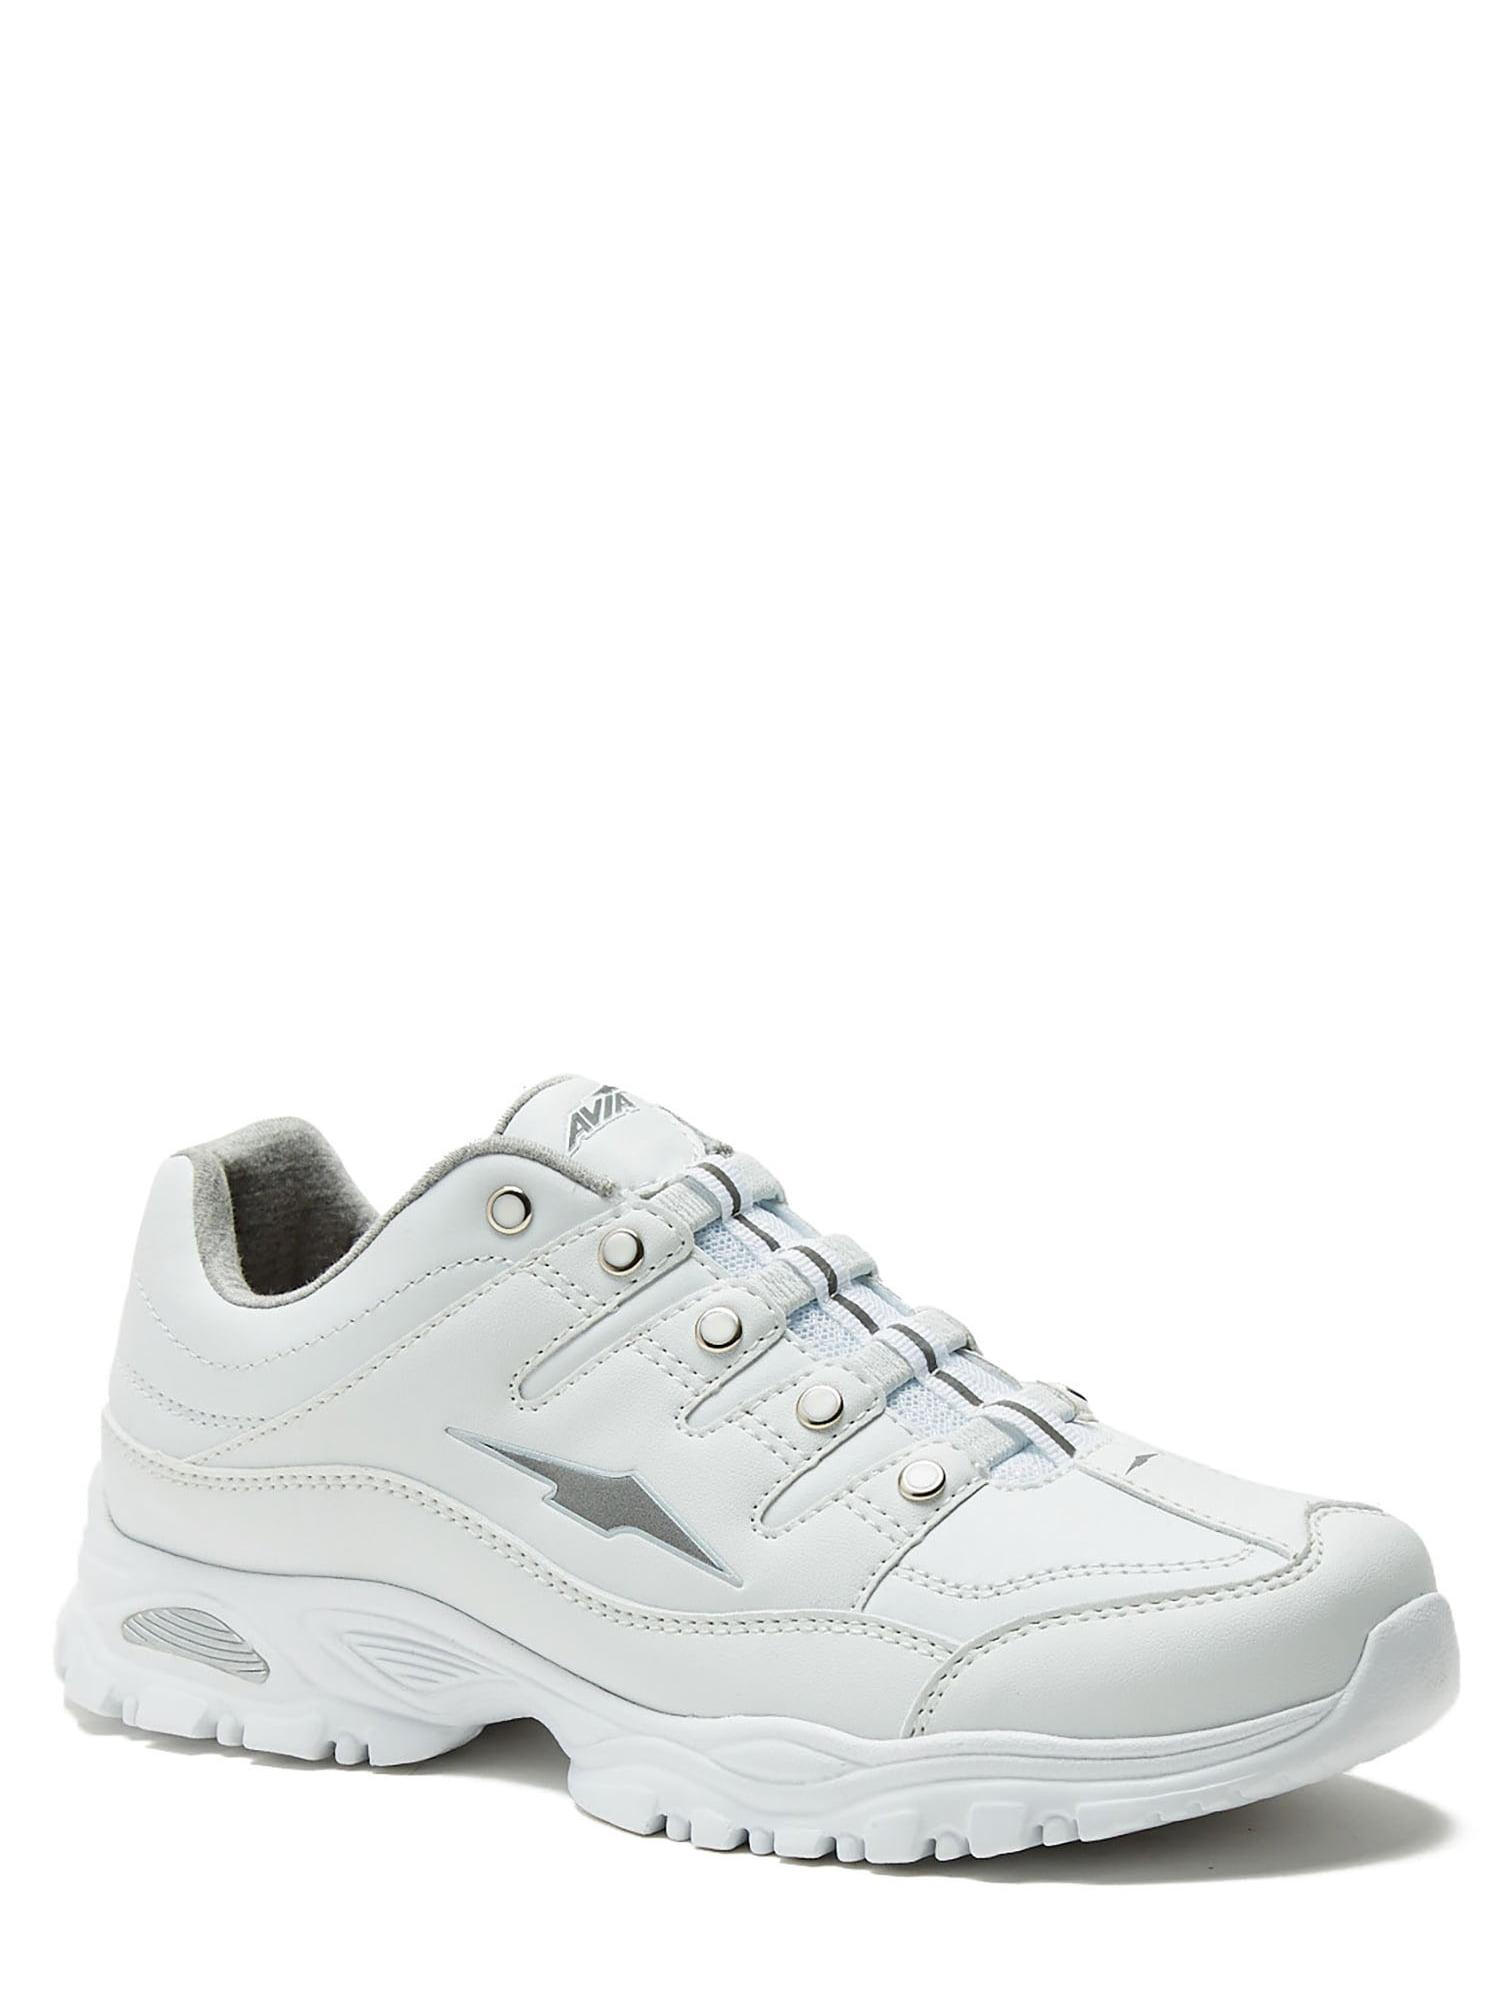 wide width tennis shoes for women